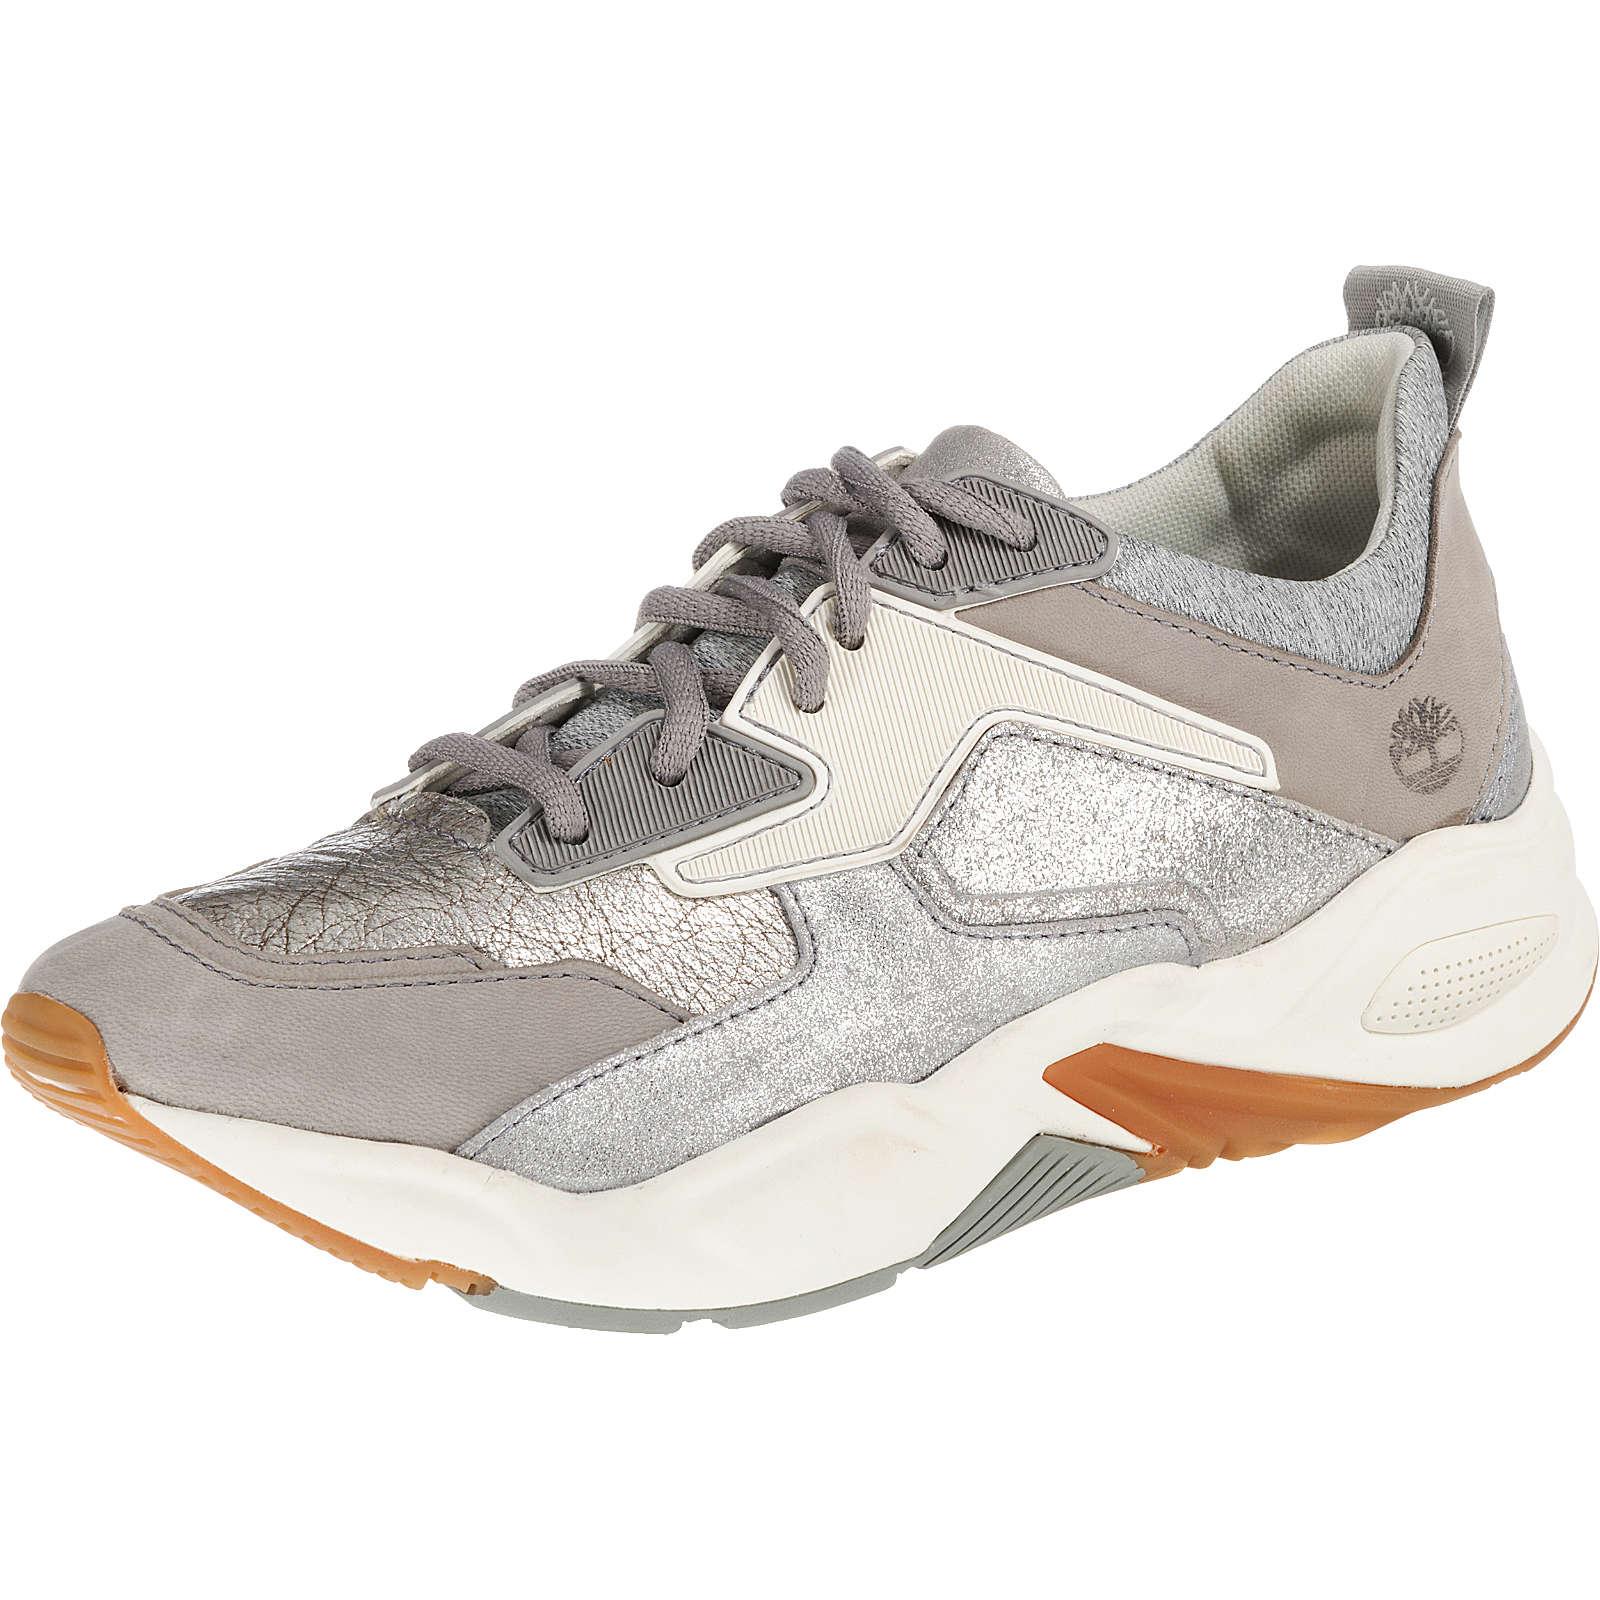 4c8c342183bb69 Timberland Delphiville Sneakers Low silber Damen Gr. 41. Hersteller   Timberland   EAN-Nummer  0192360654006